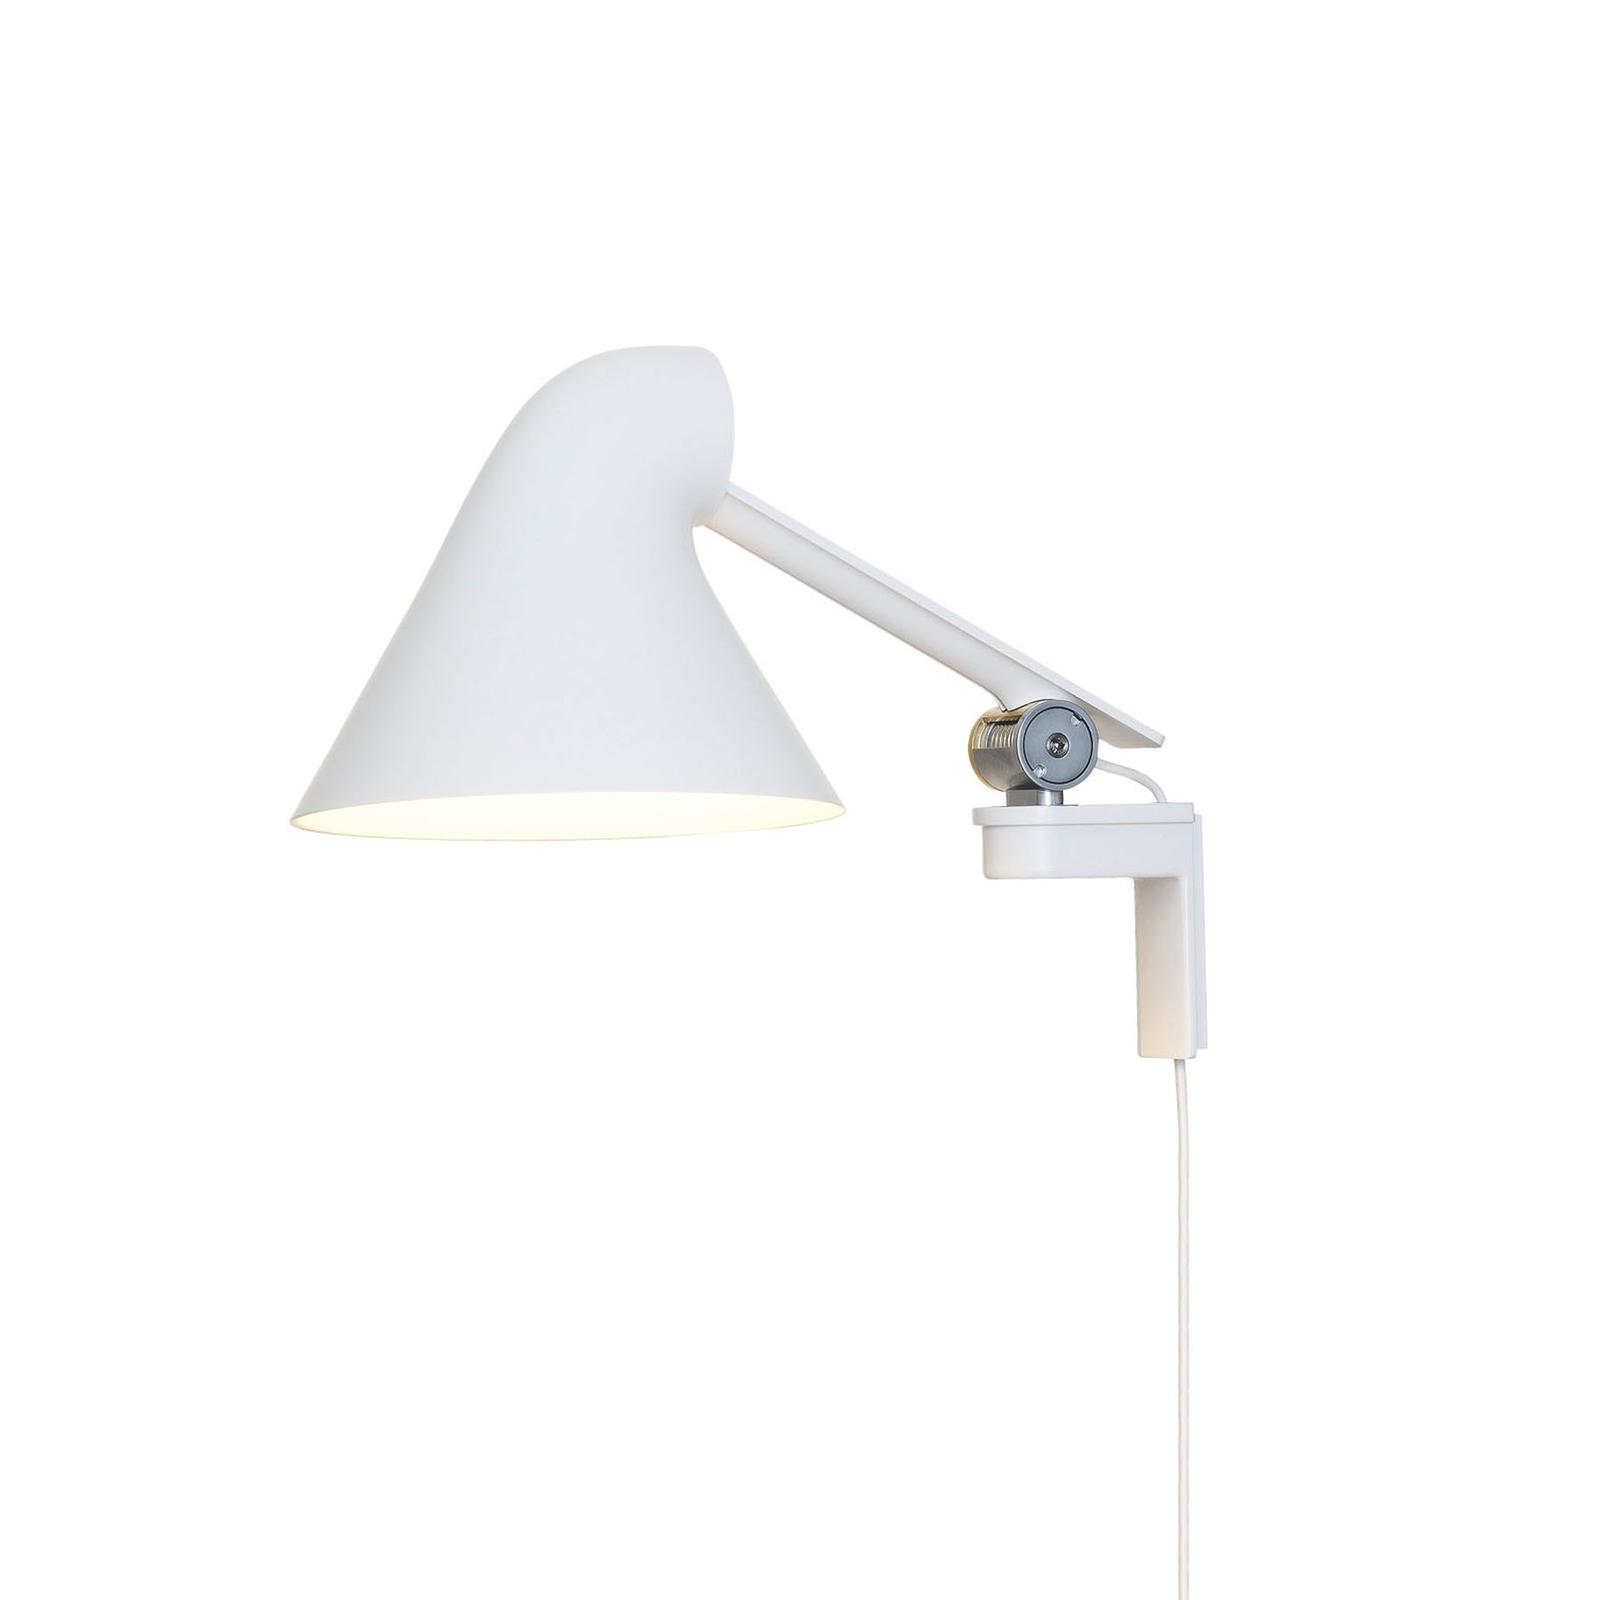 Louis Poulsen NJP LED wandlamp arm kort, wit